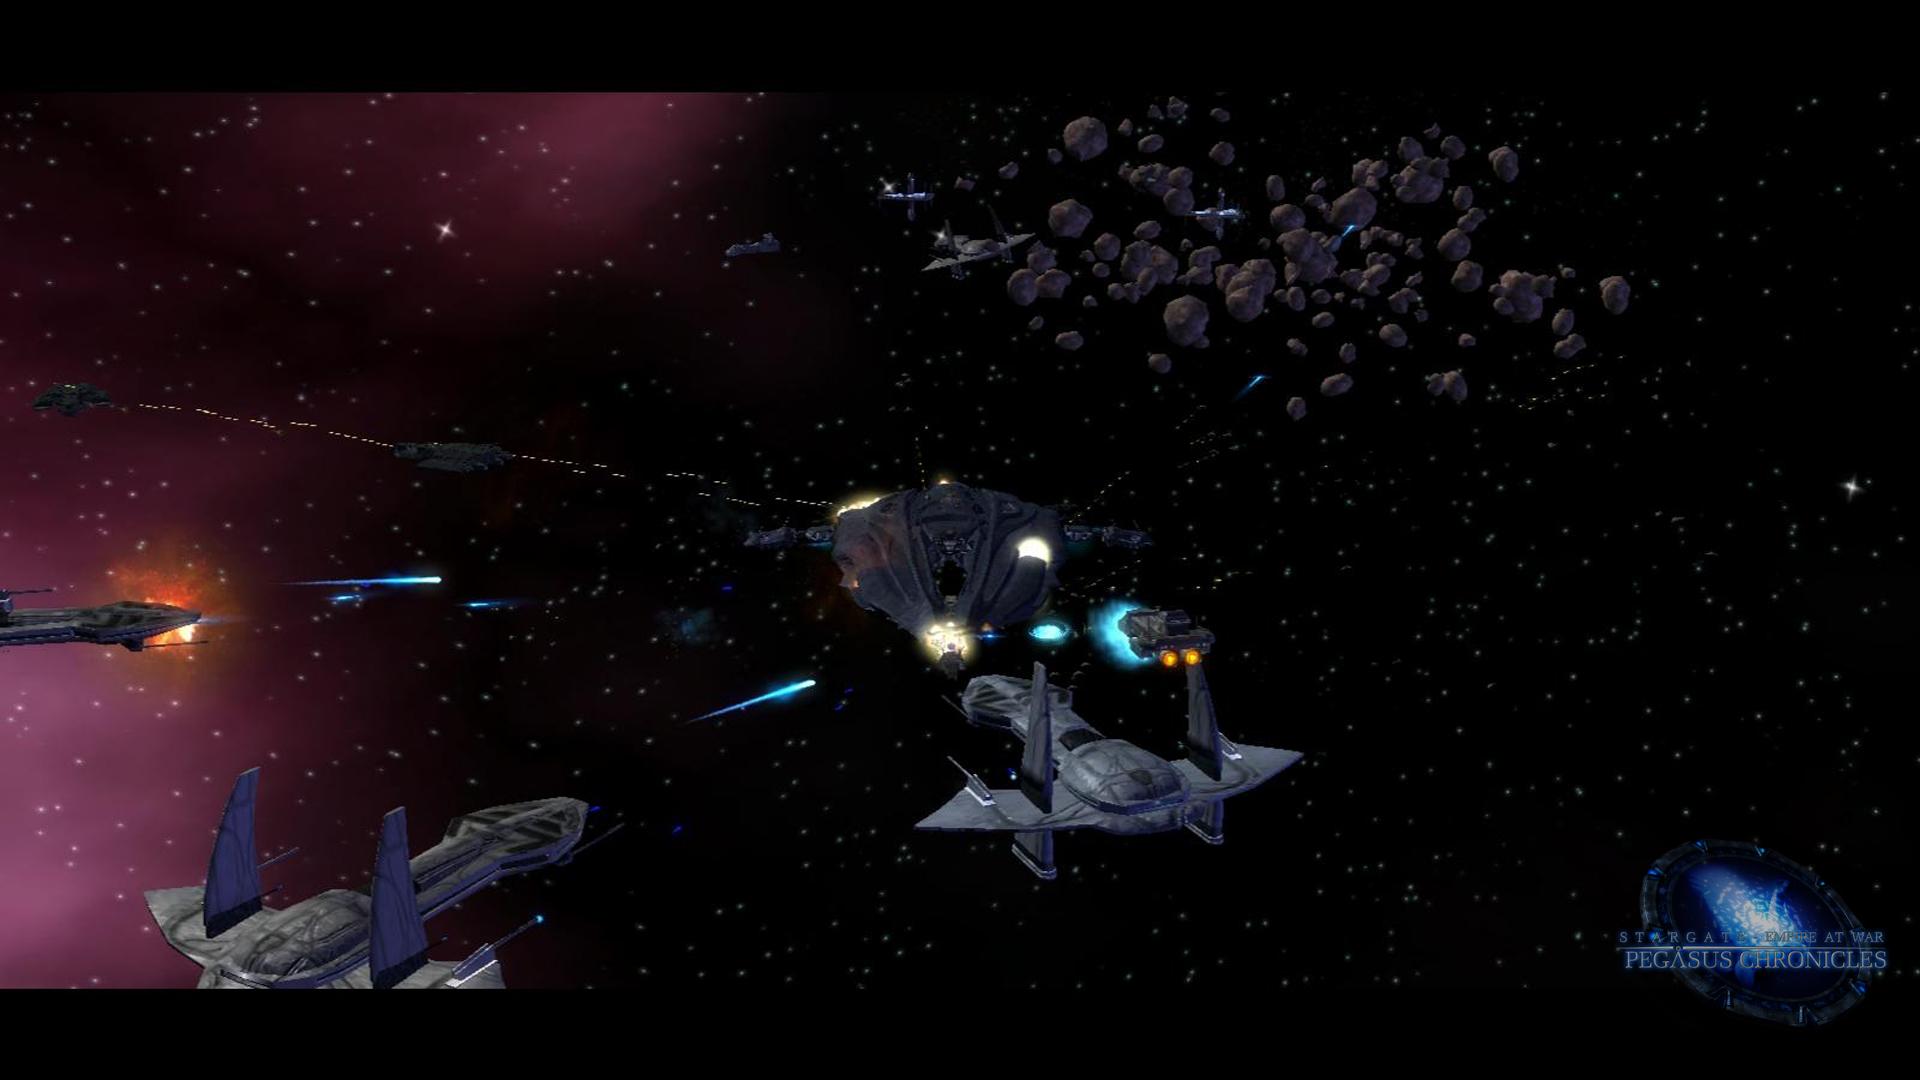 Stargate Star Wars Empire at War Stargate EaW 1 1 English at